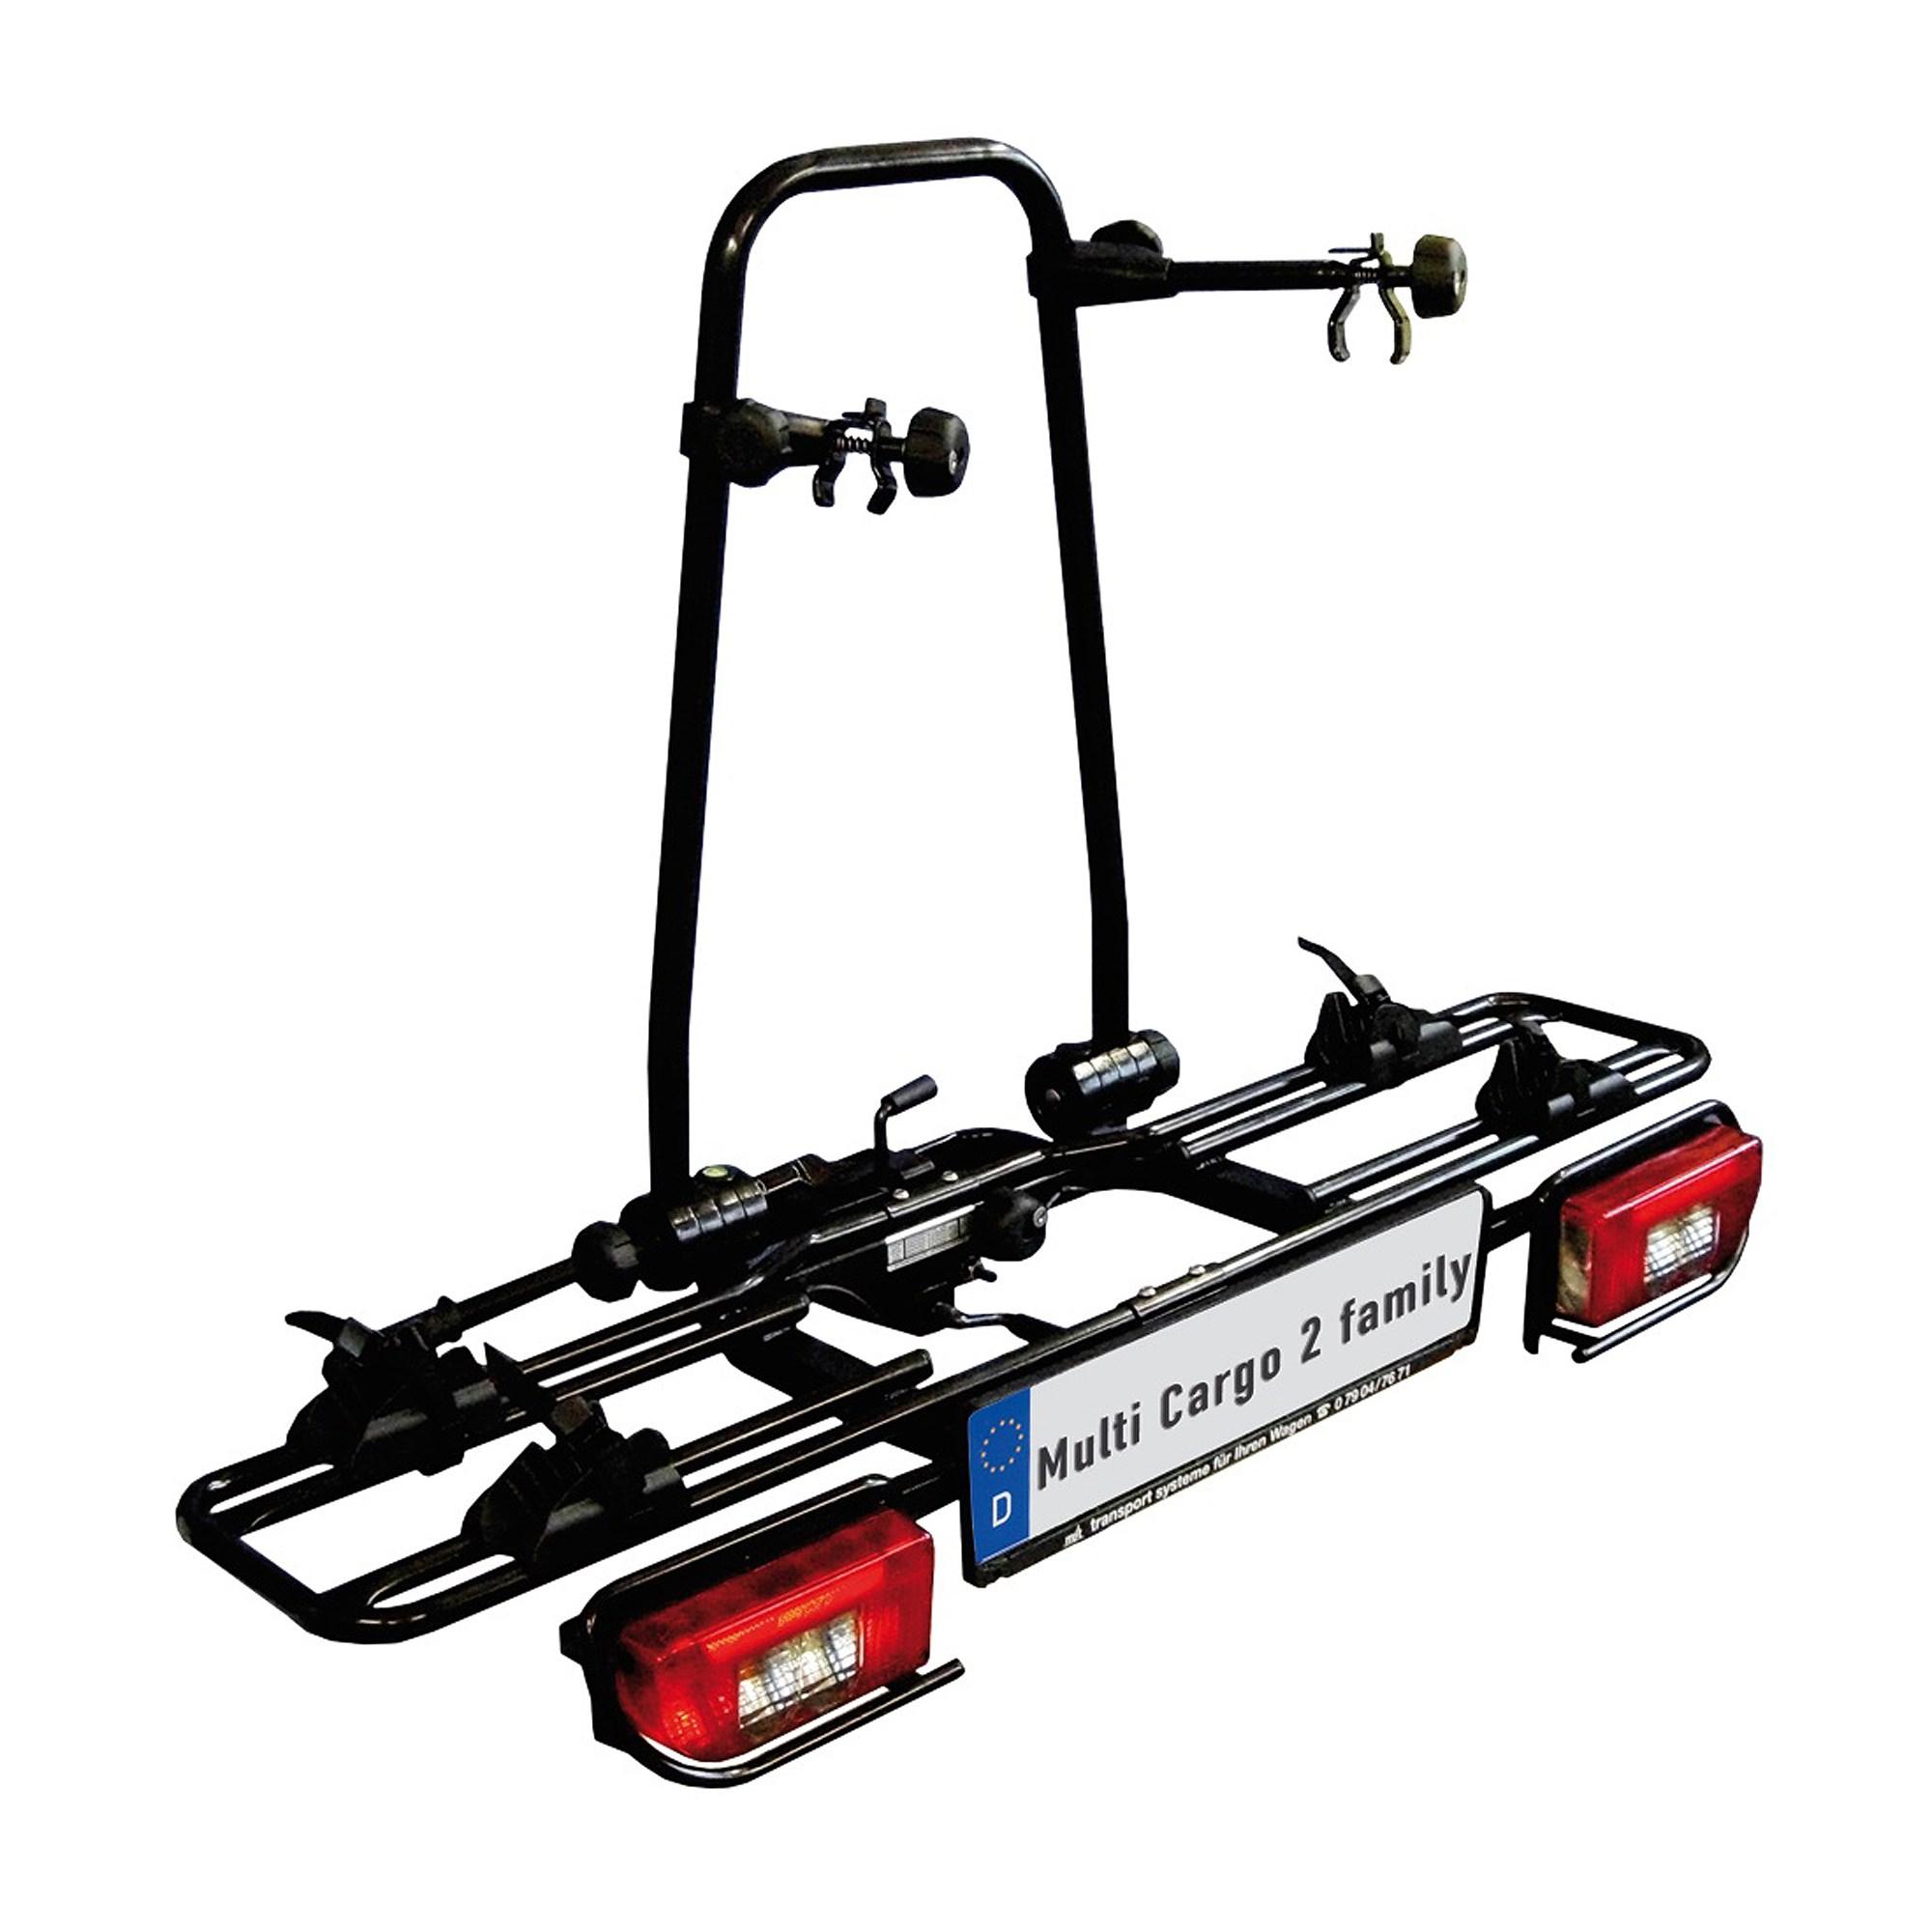 mft multi cargo 2 family fahrradtr ger ahk. Black Bedroom Furniture Sets. Home Design Ideas